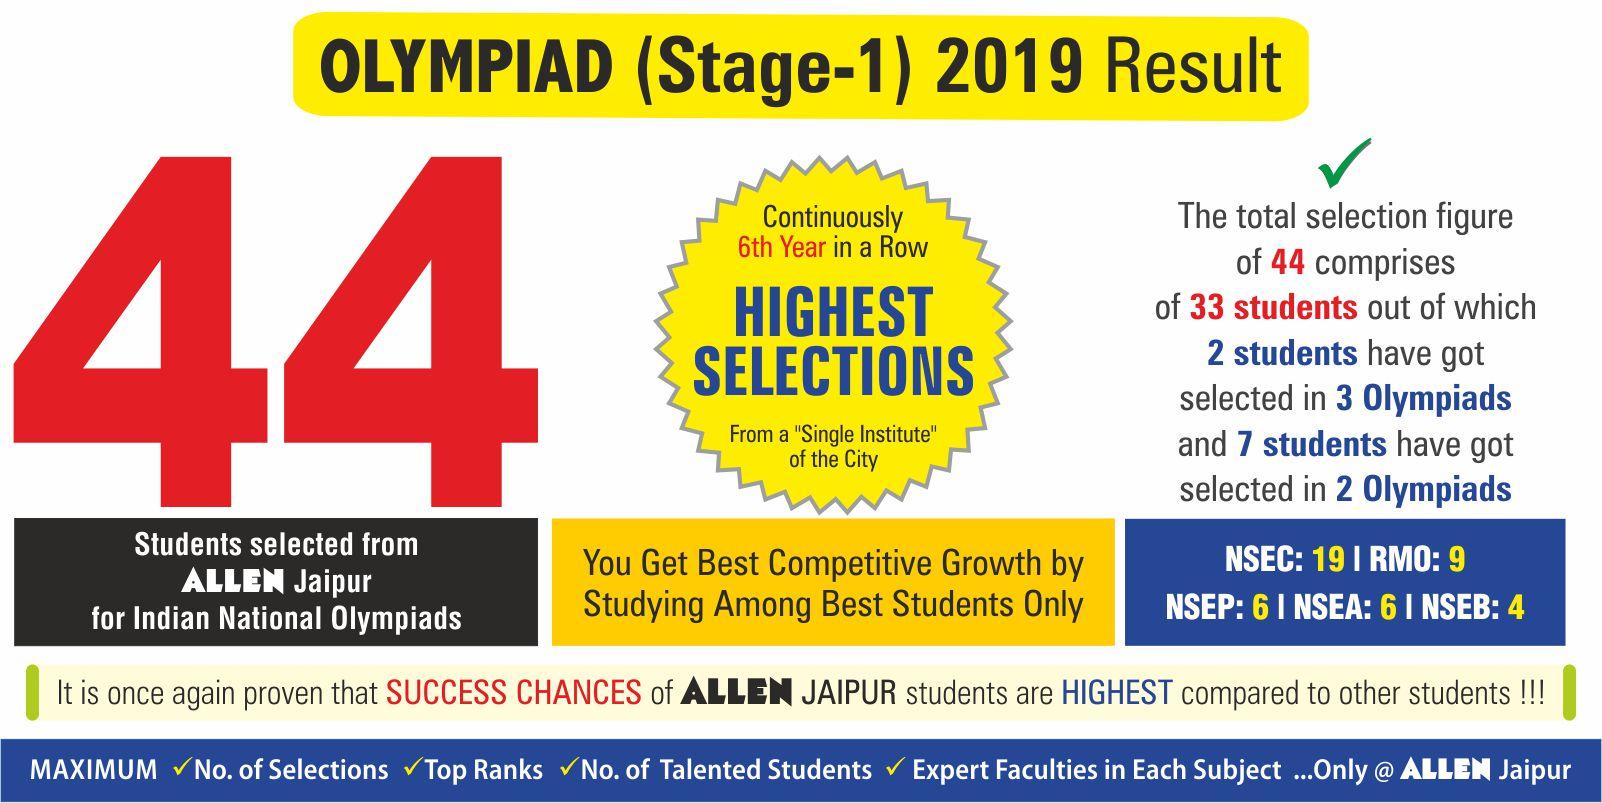 Olympiad (Stage-1) 2019